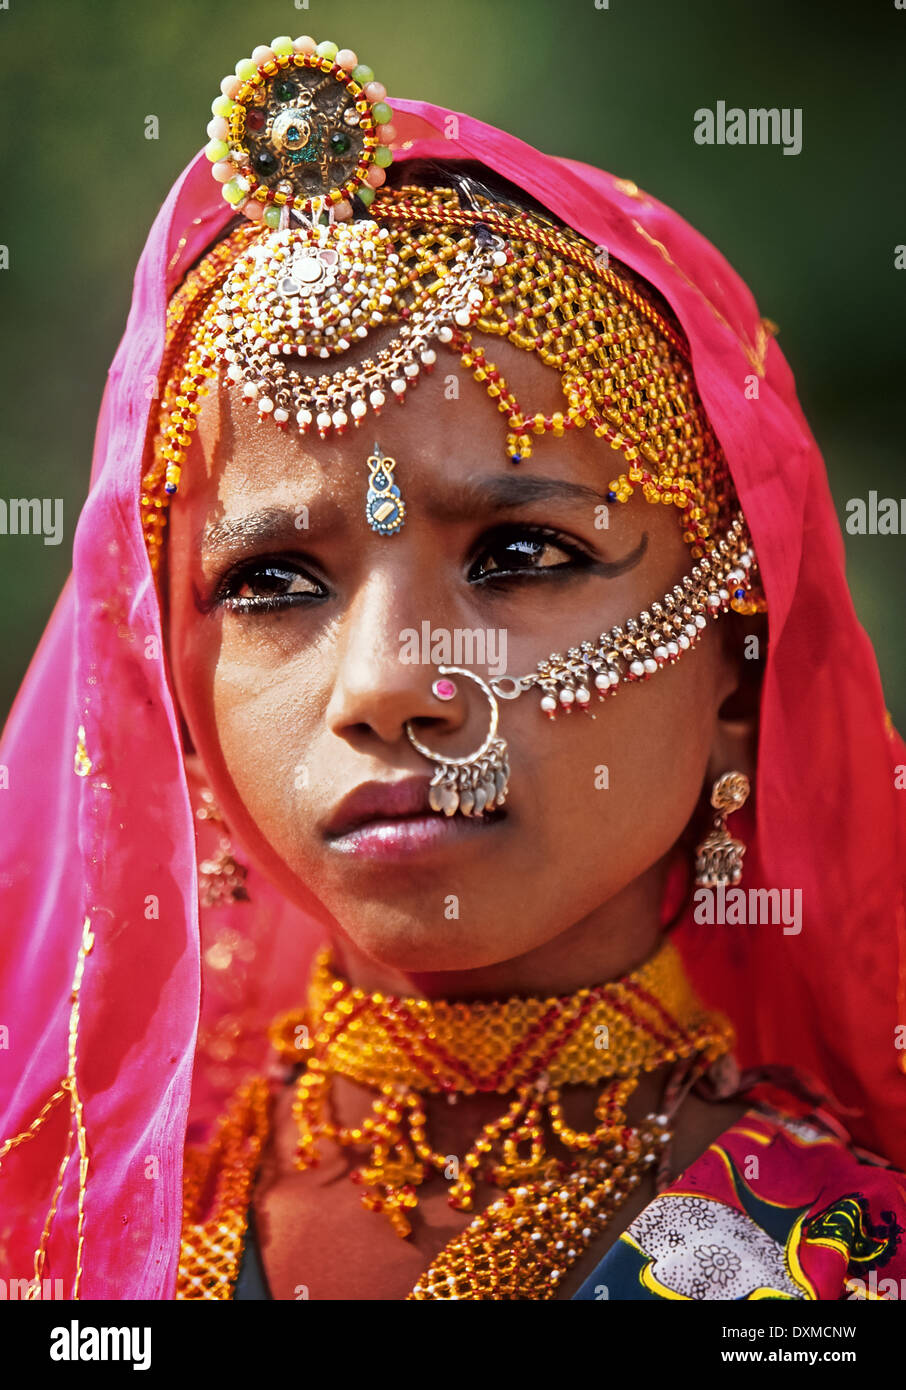 Portrait of Indian girl dancer wearing jewellery, at Mehrangarh Fort in Jodhpur, India. Digitally Manipulated Image - Stock Image